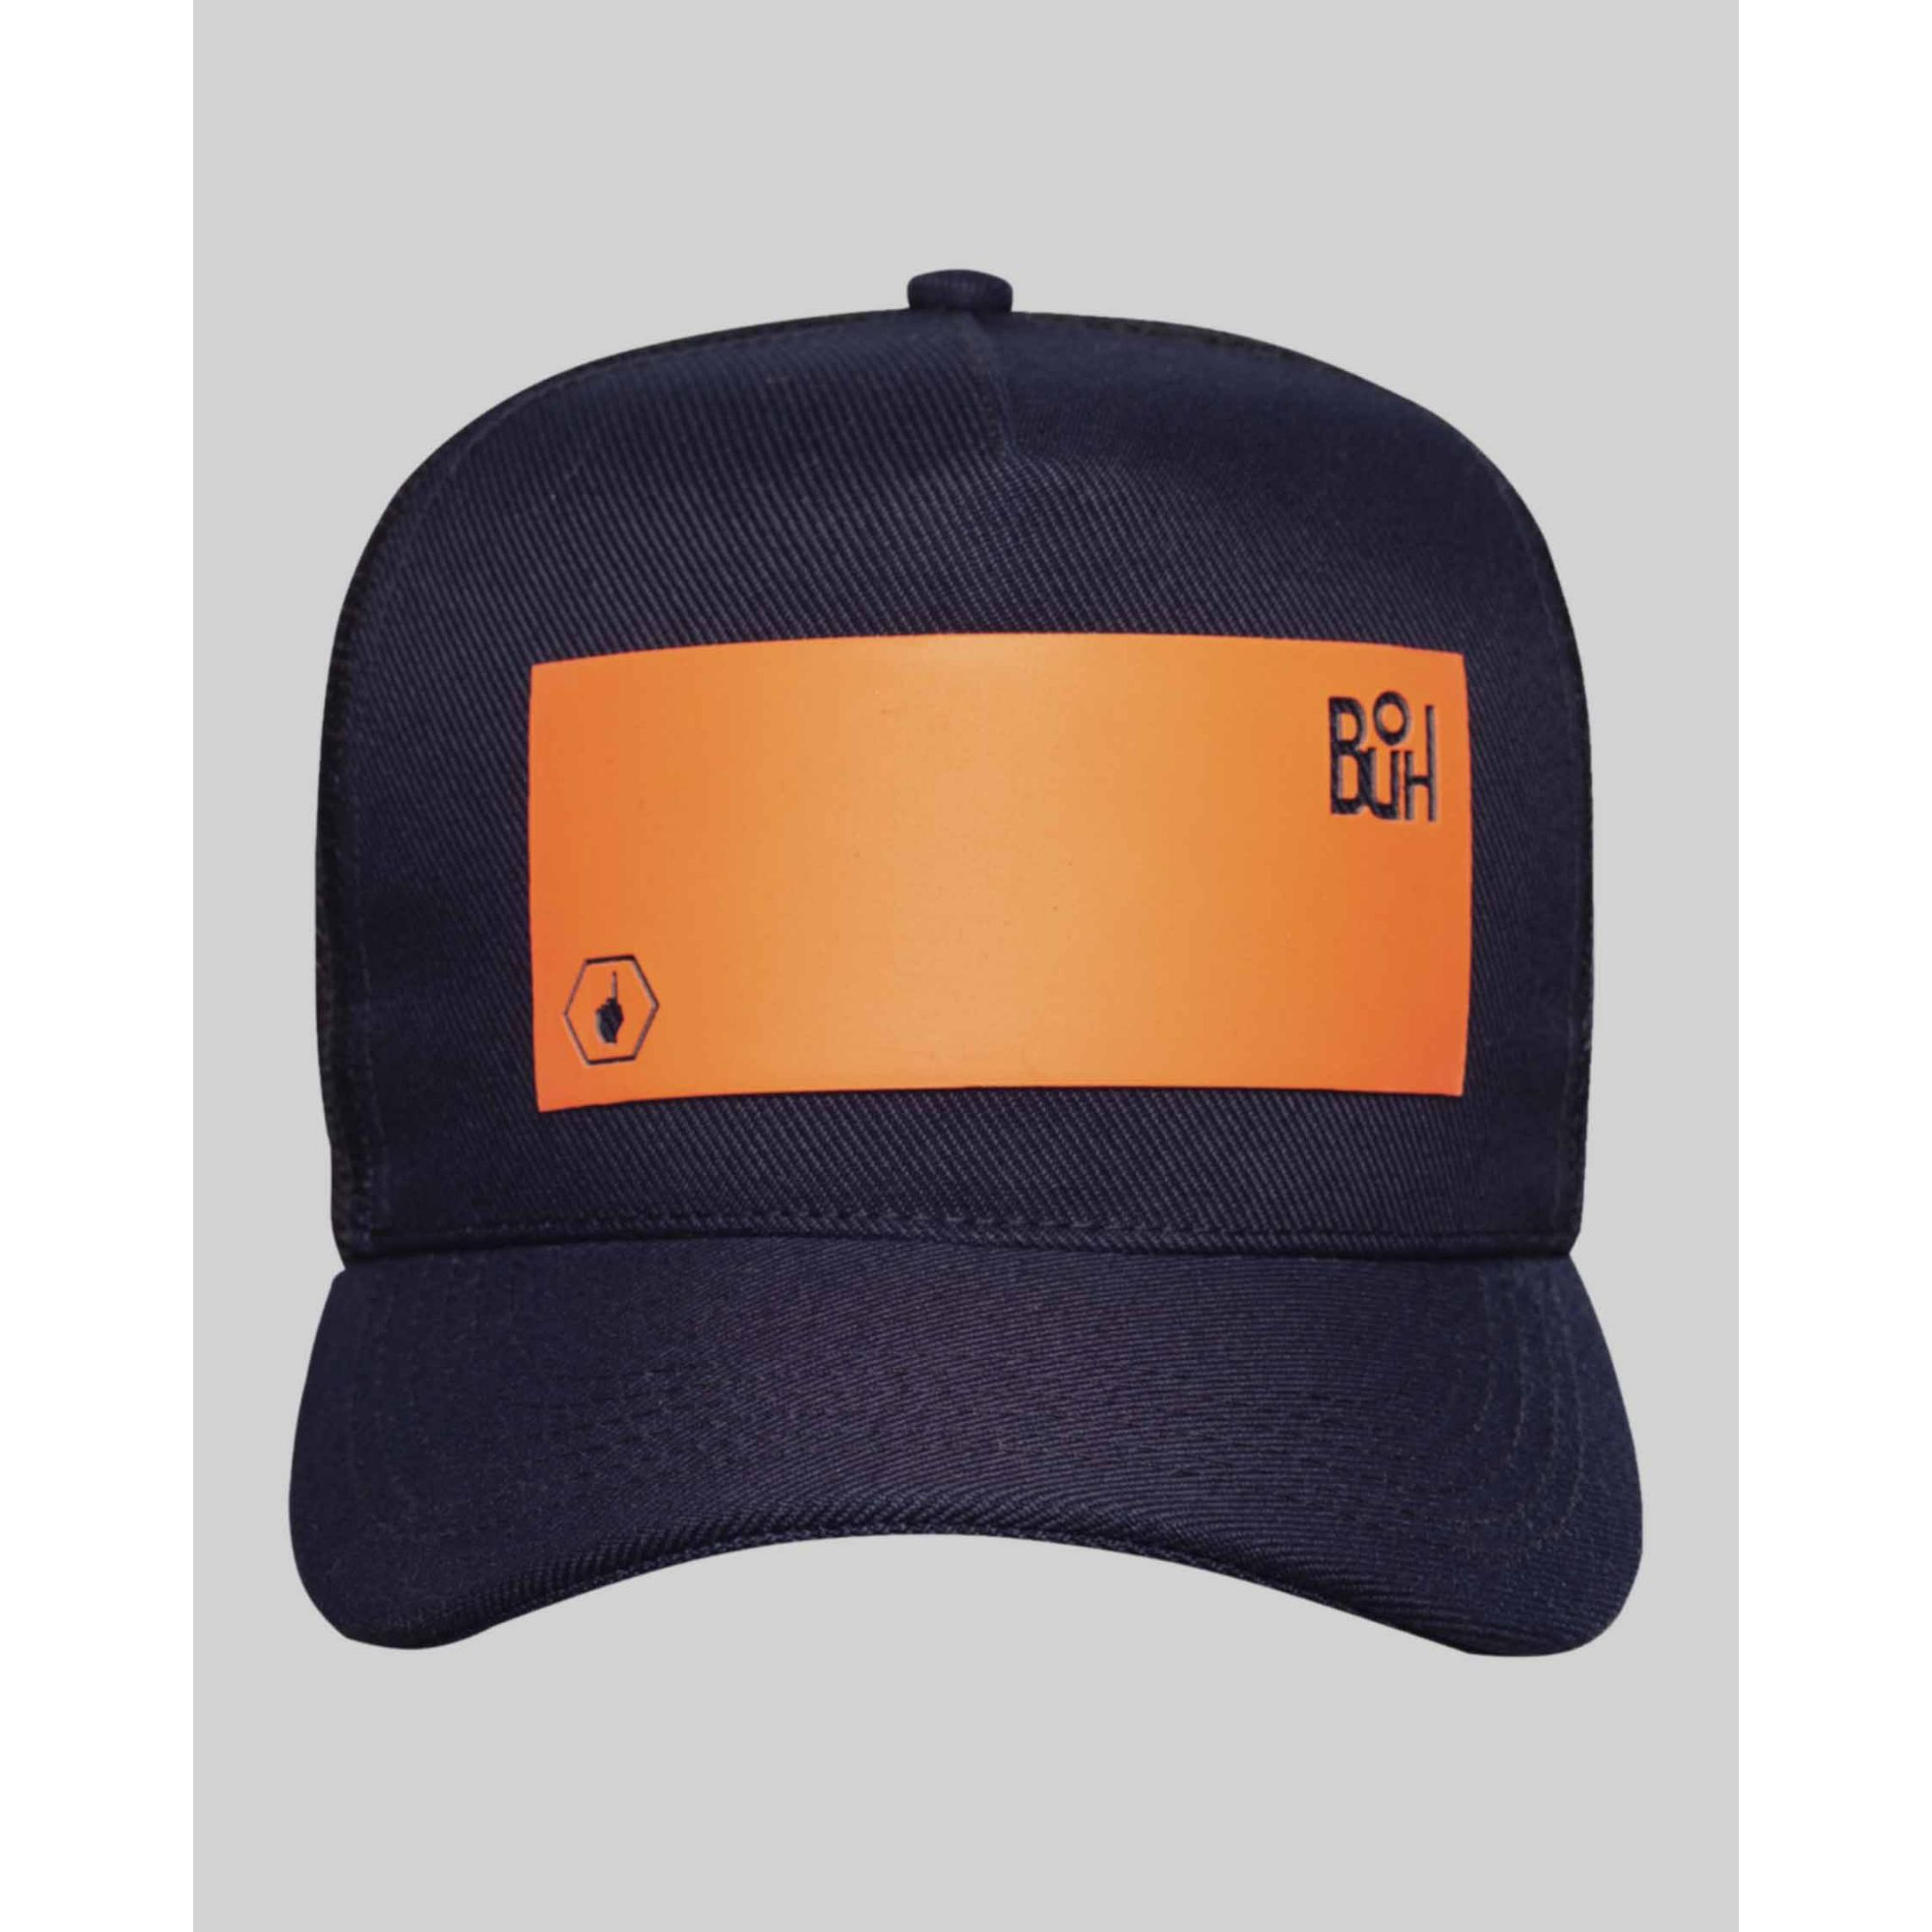 Boné Buh Fluor Square Black & Orange